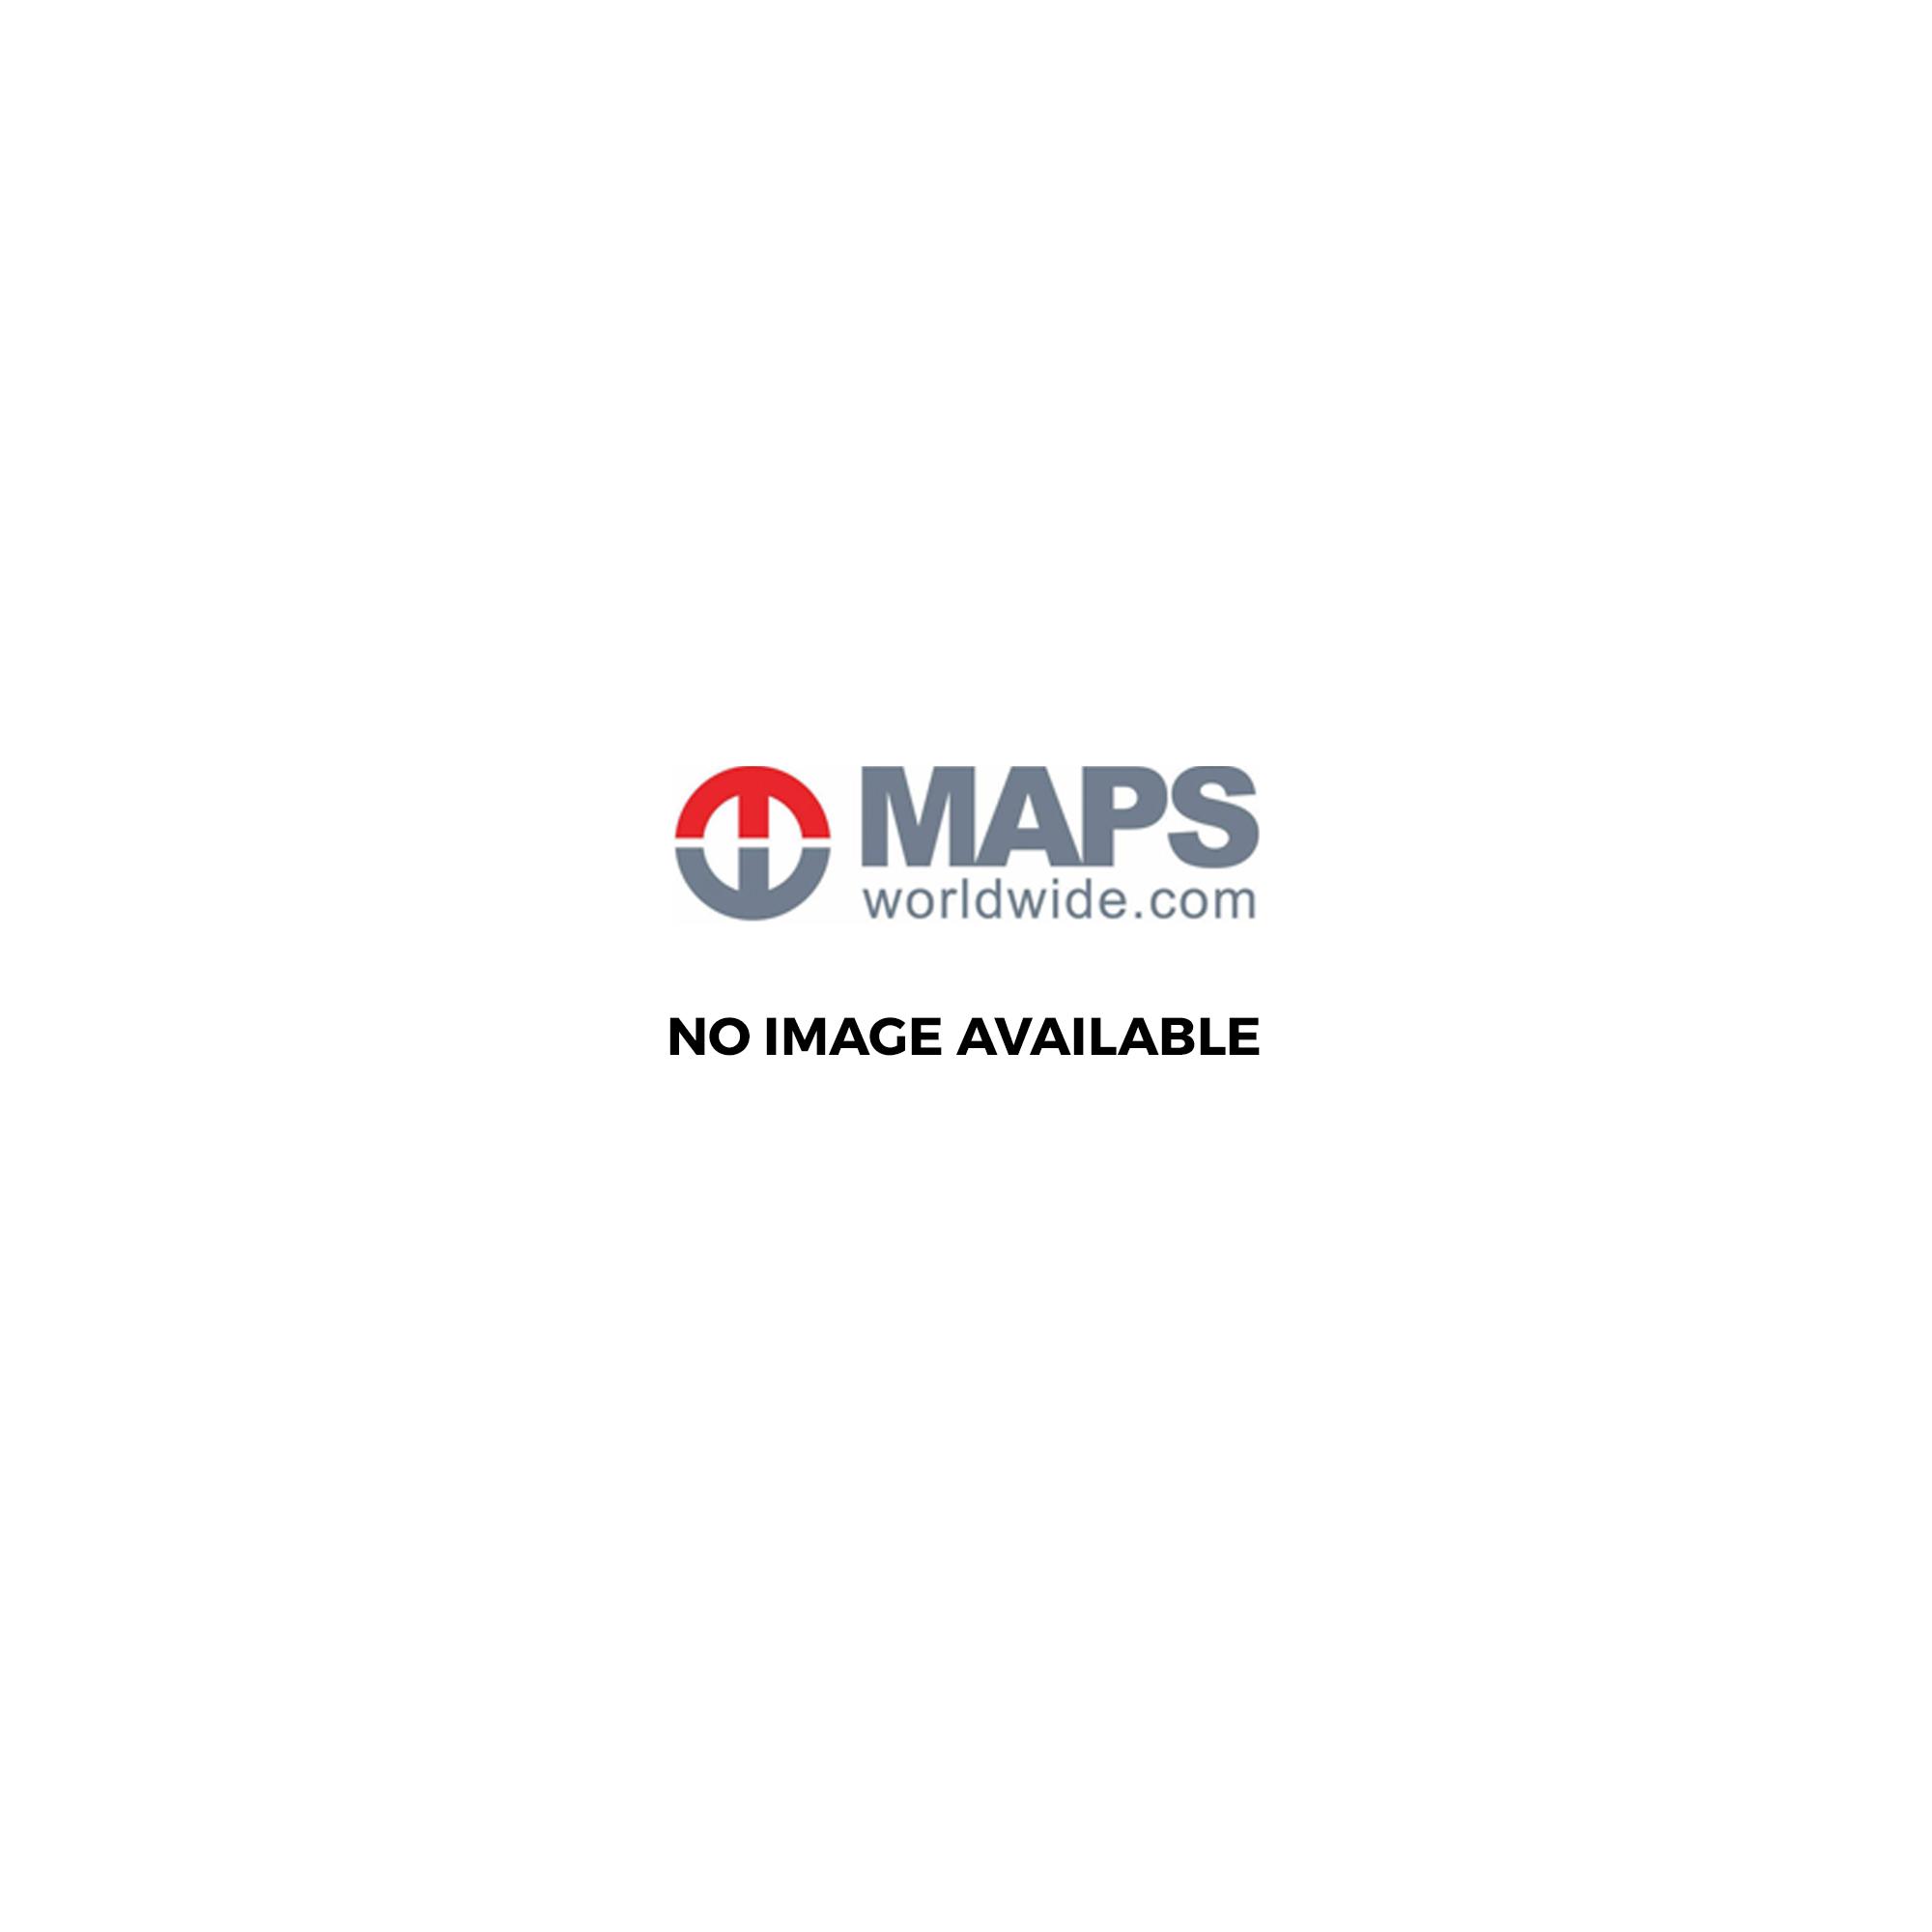 Old Ordnance Survey Map Porthmadog Wales 1913 Sheet 34.16 Brand New